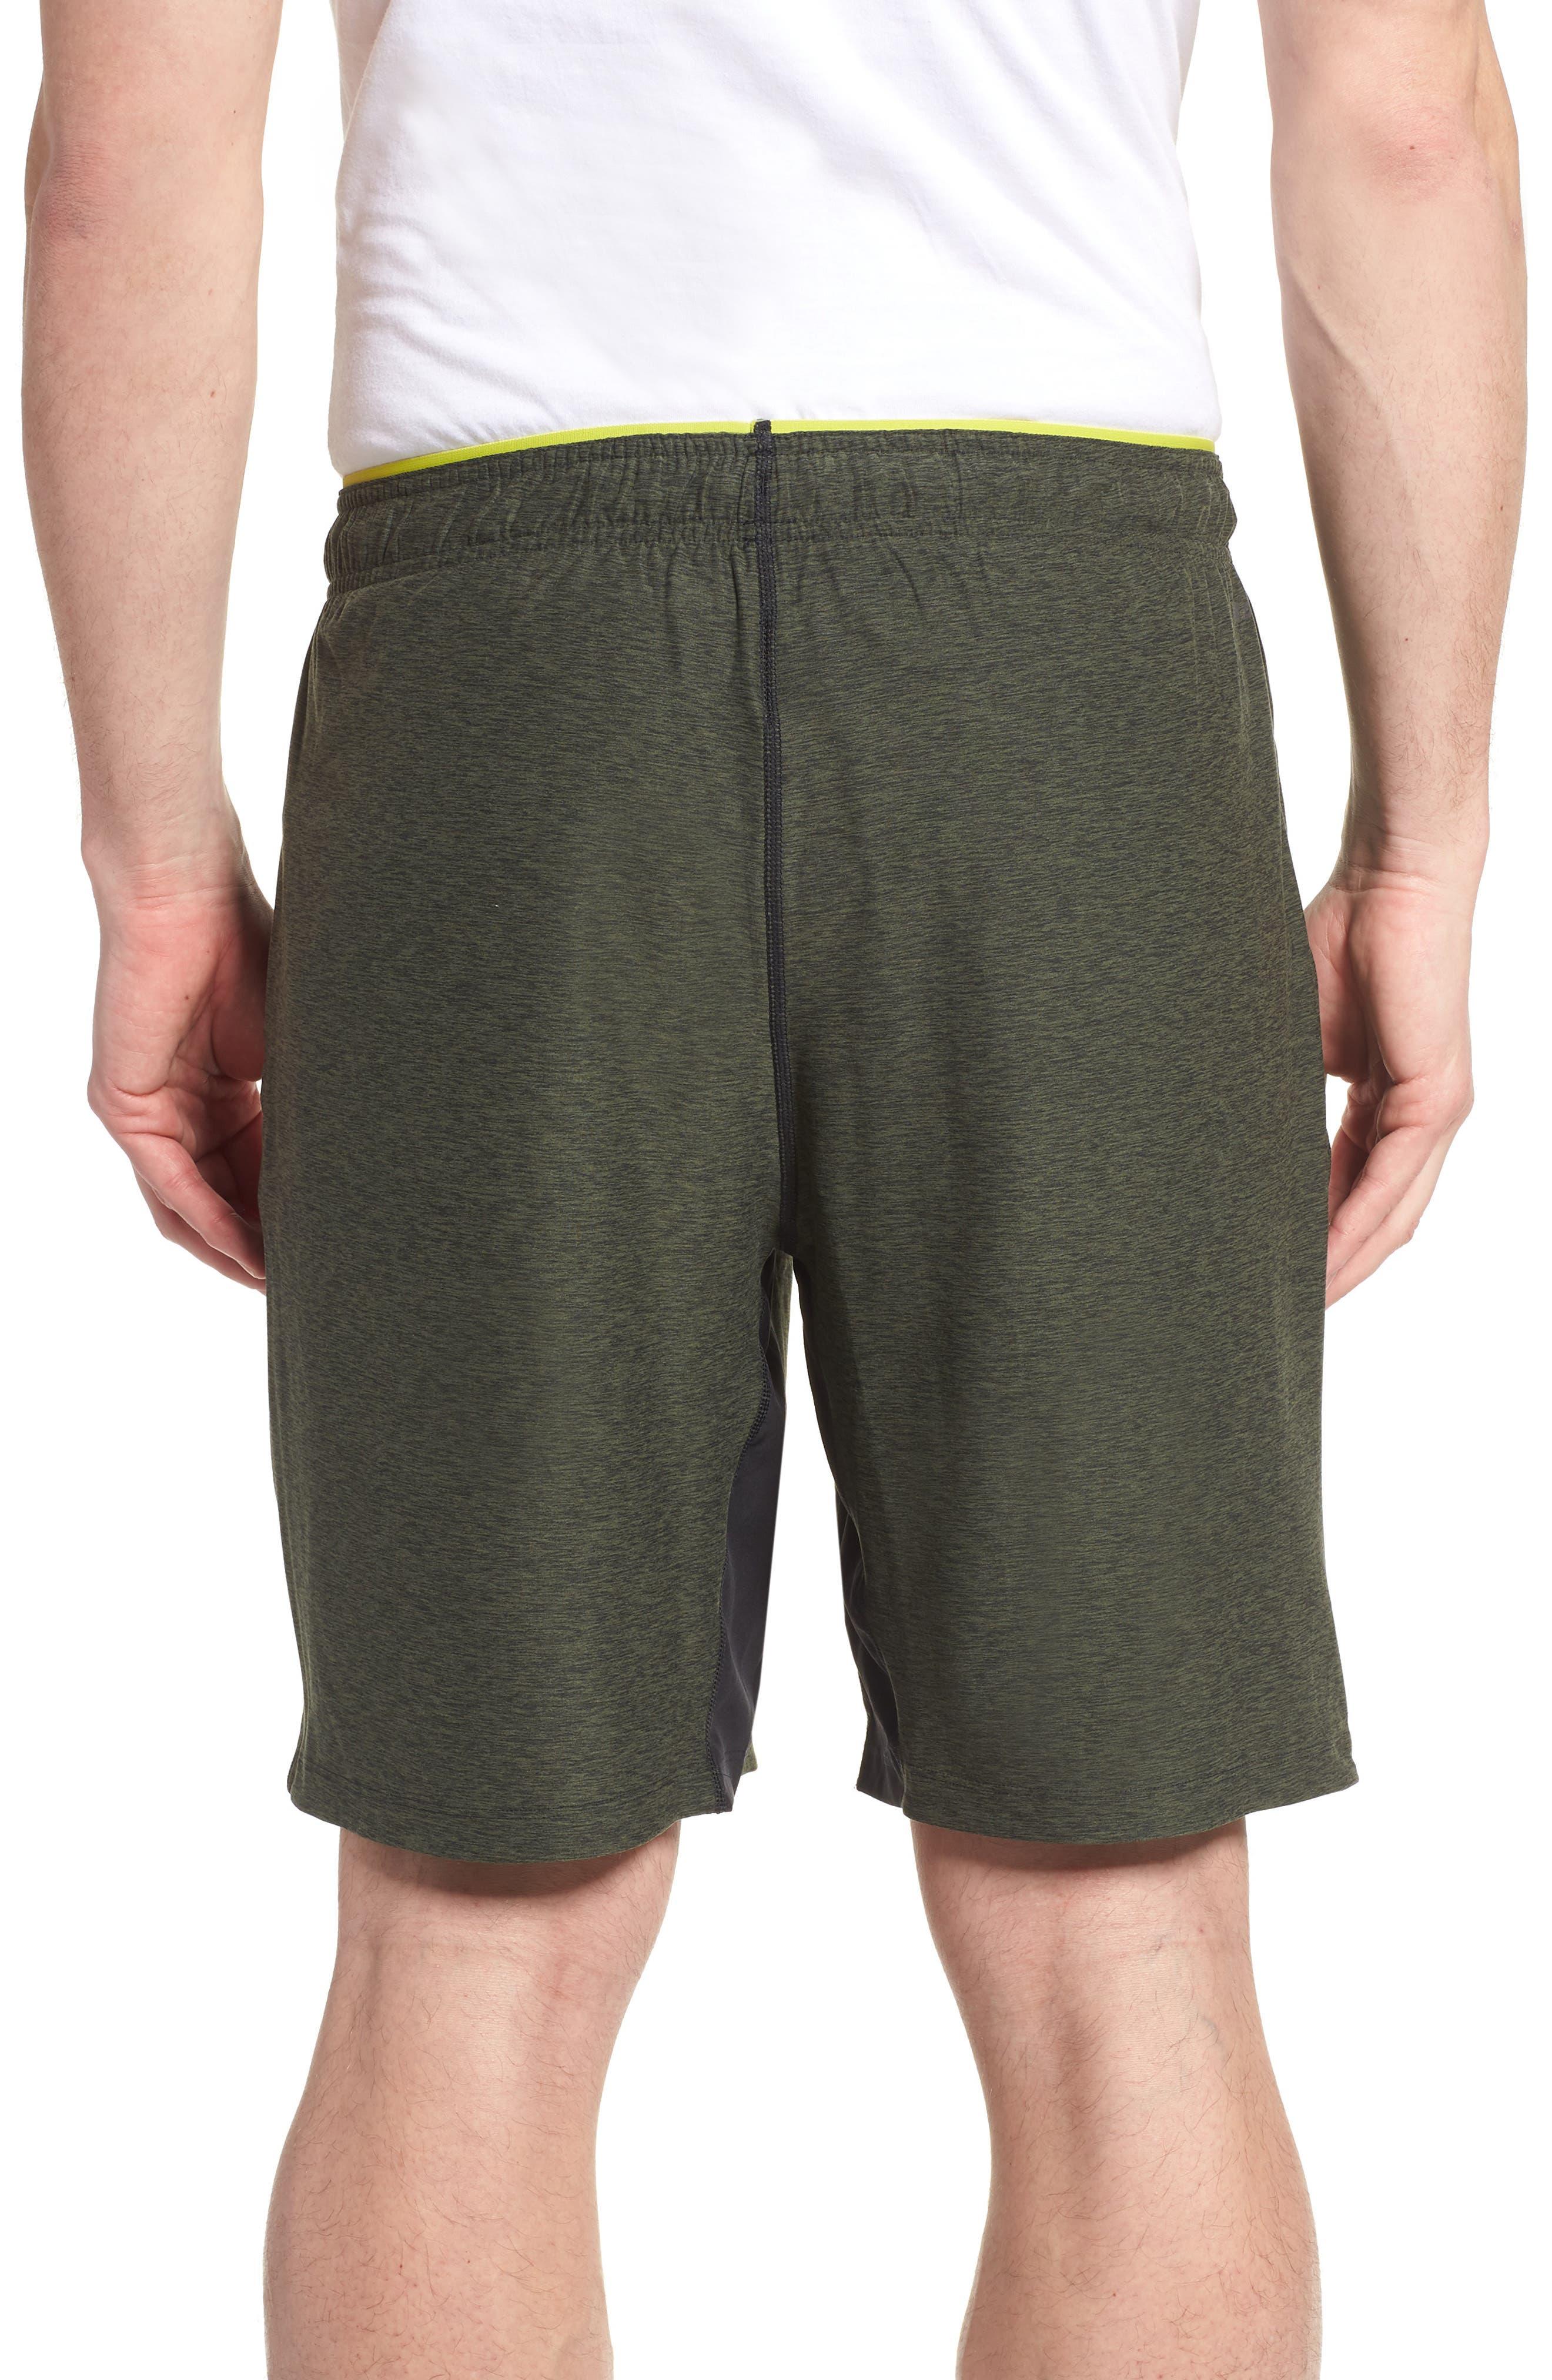 Anticipate Shorts,                             Alternate thumbnail 2, color,                             Dark Covert Green